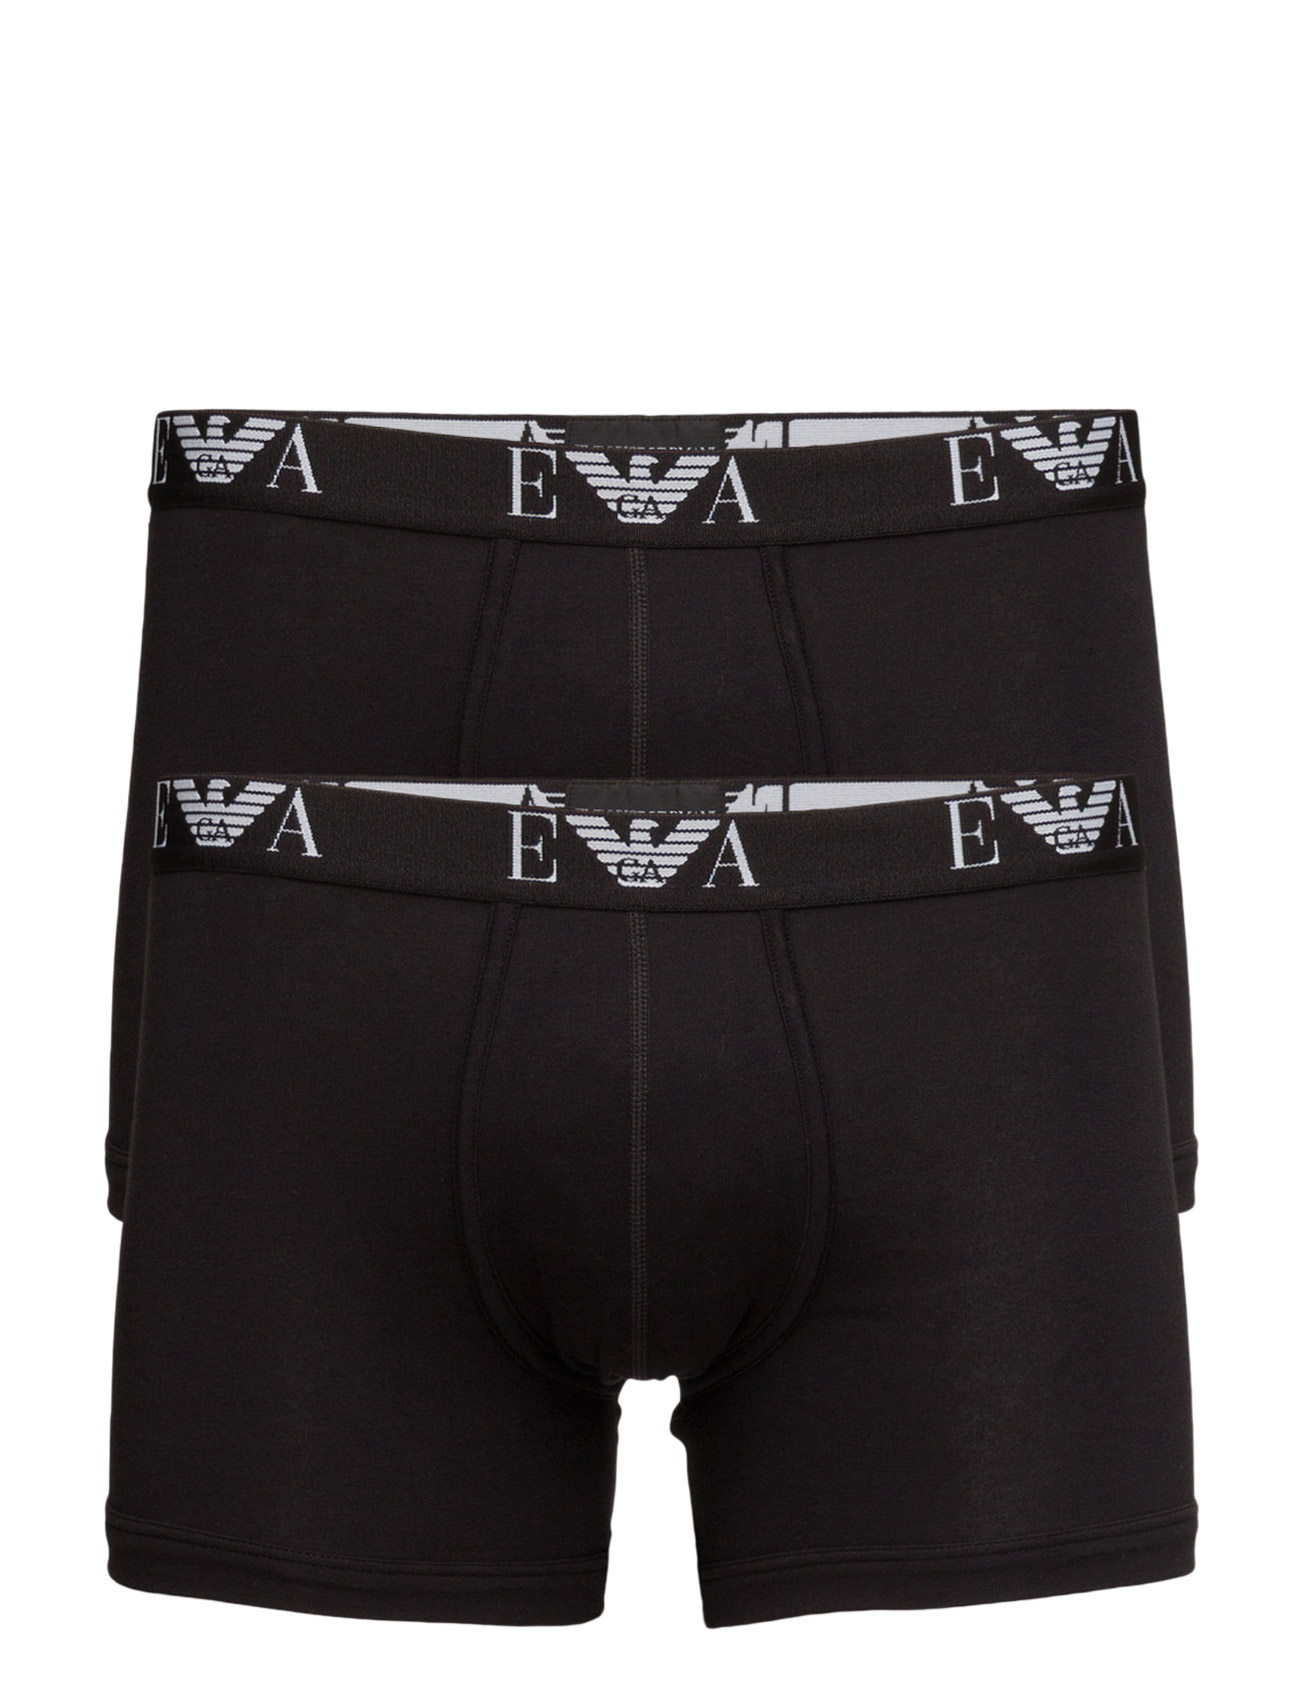 Mens knit 2pack boxe fra emporio armani på boozt.com dk